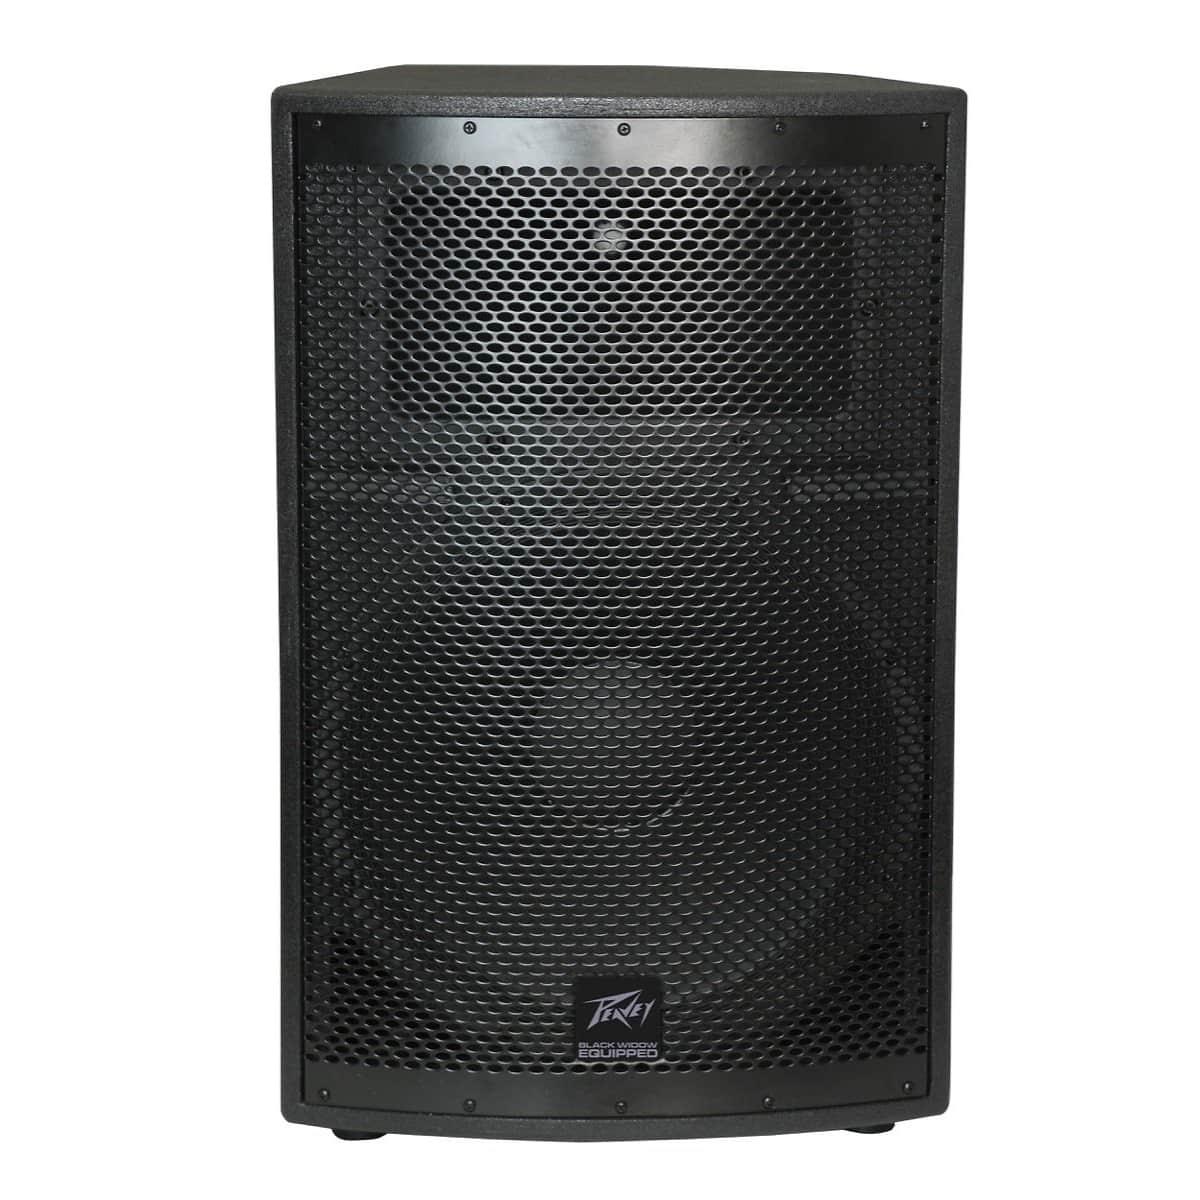 peavey sp2 ii passive speaker 500 watts 1x15 single reverb. Black Bedroom Furniture Sets. Home Design Ideas